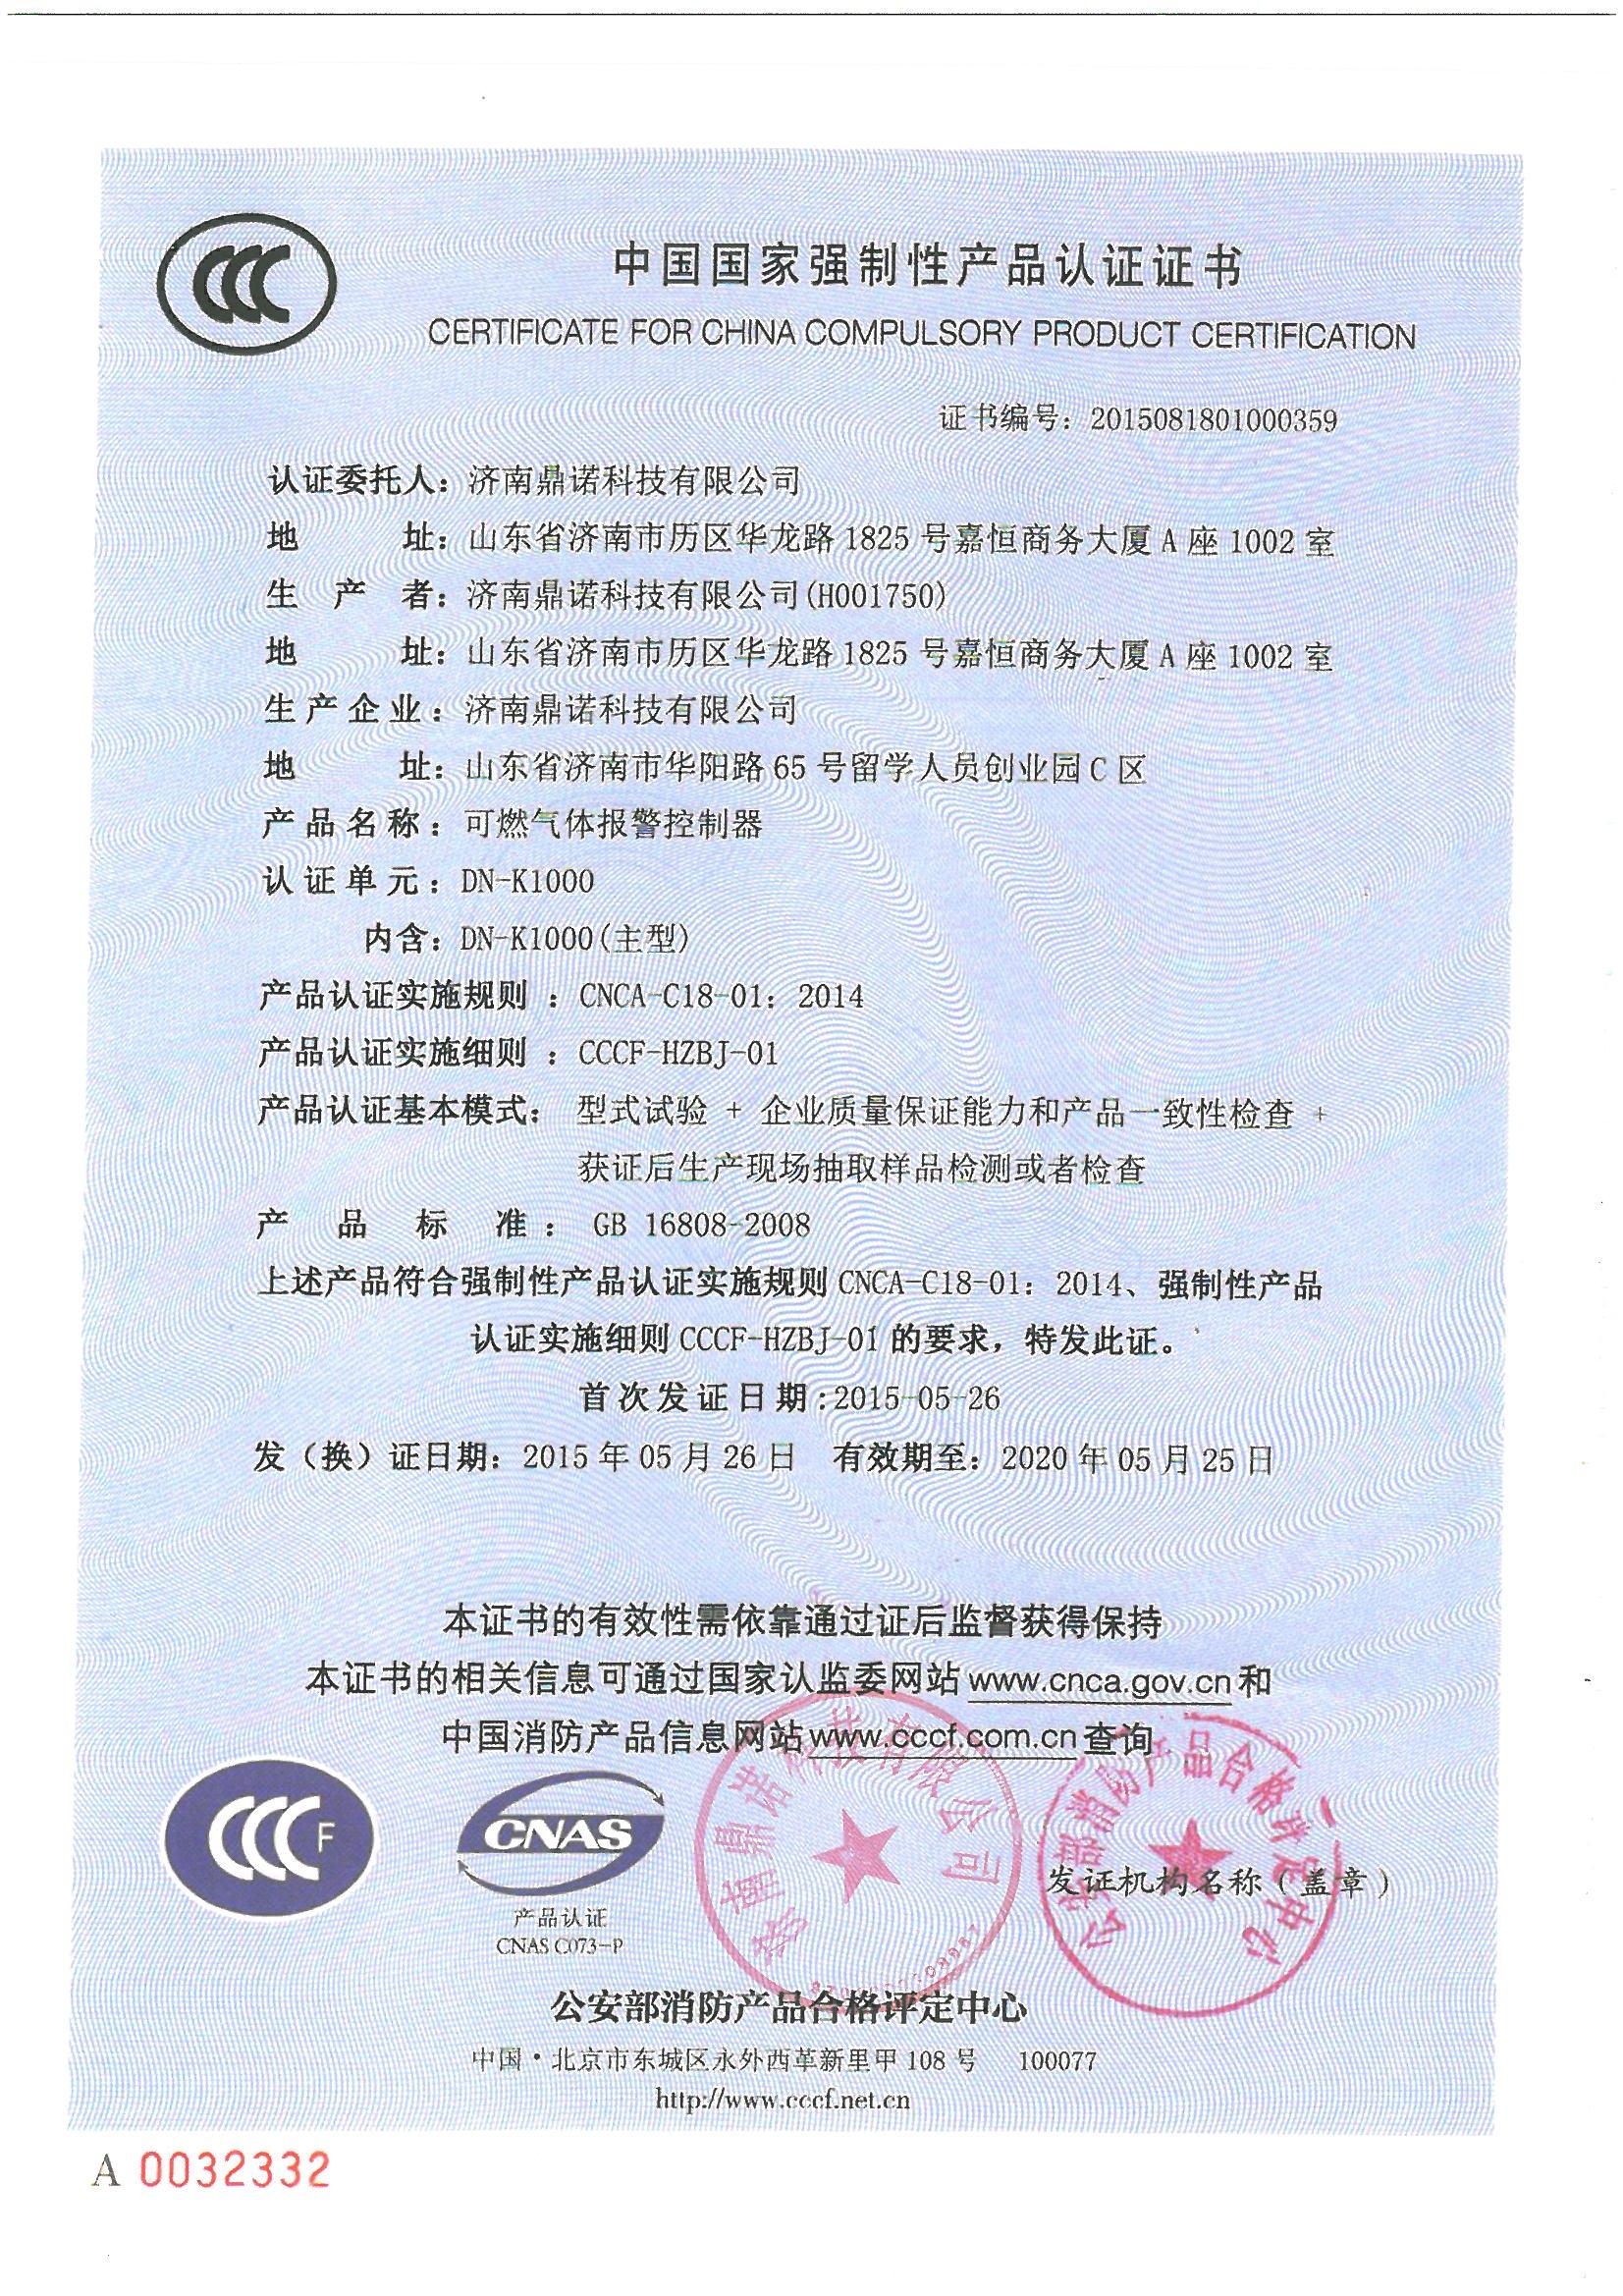 DN-K1000型强制认证证书